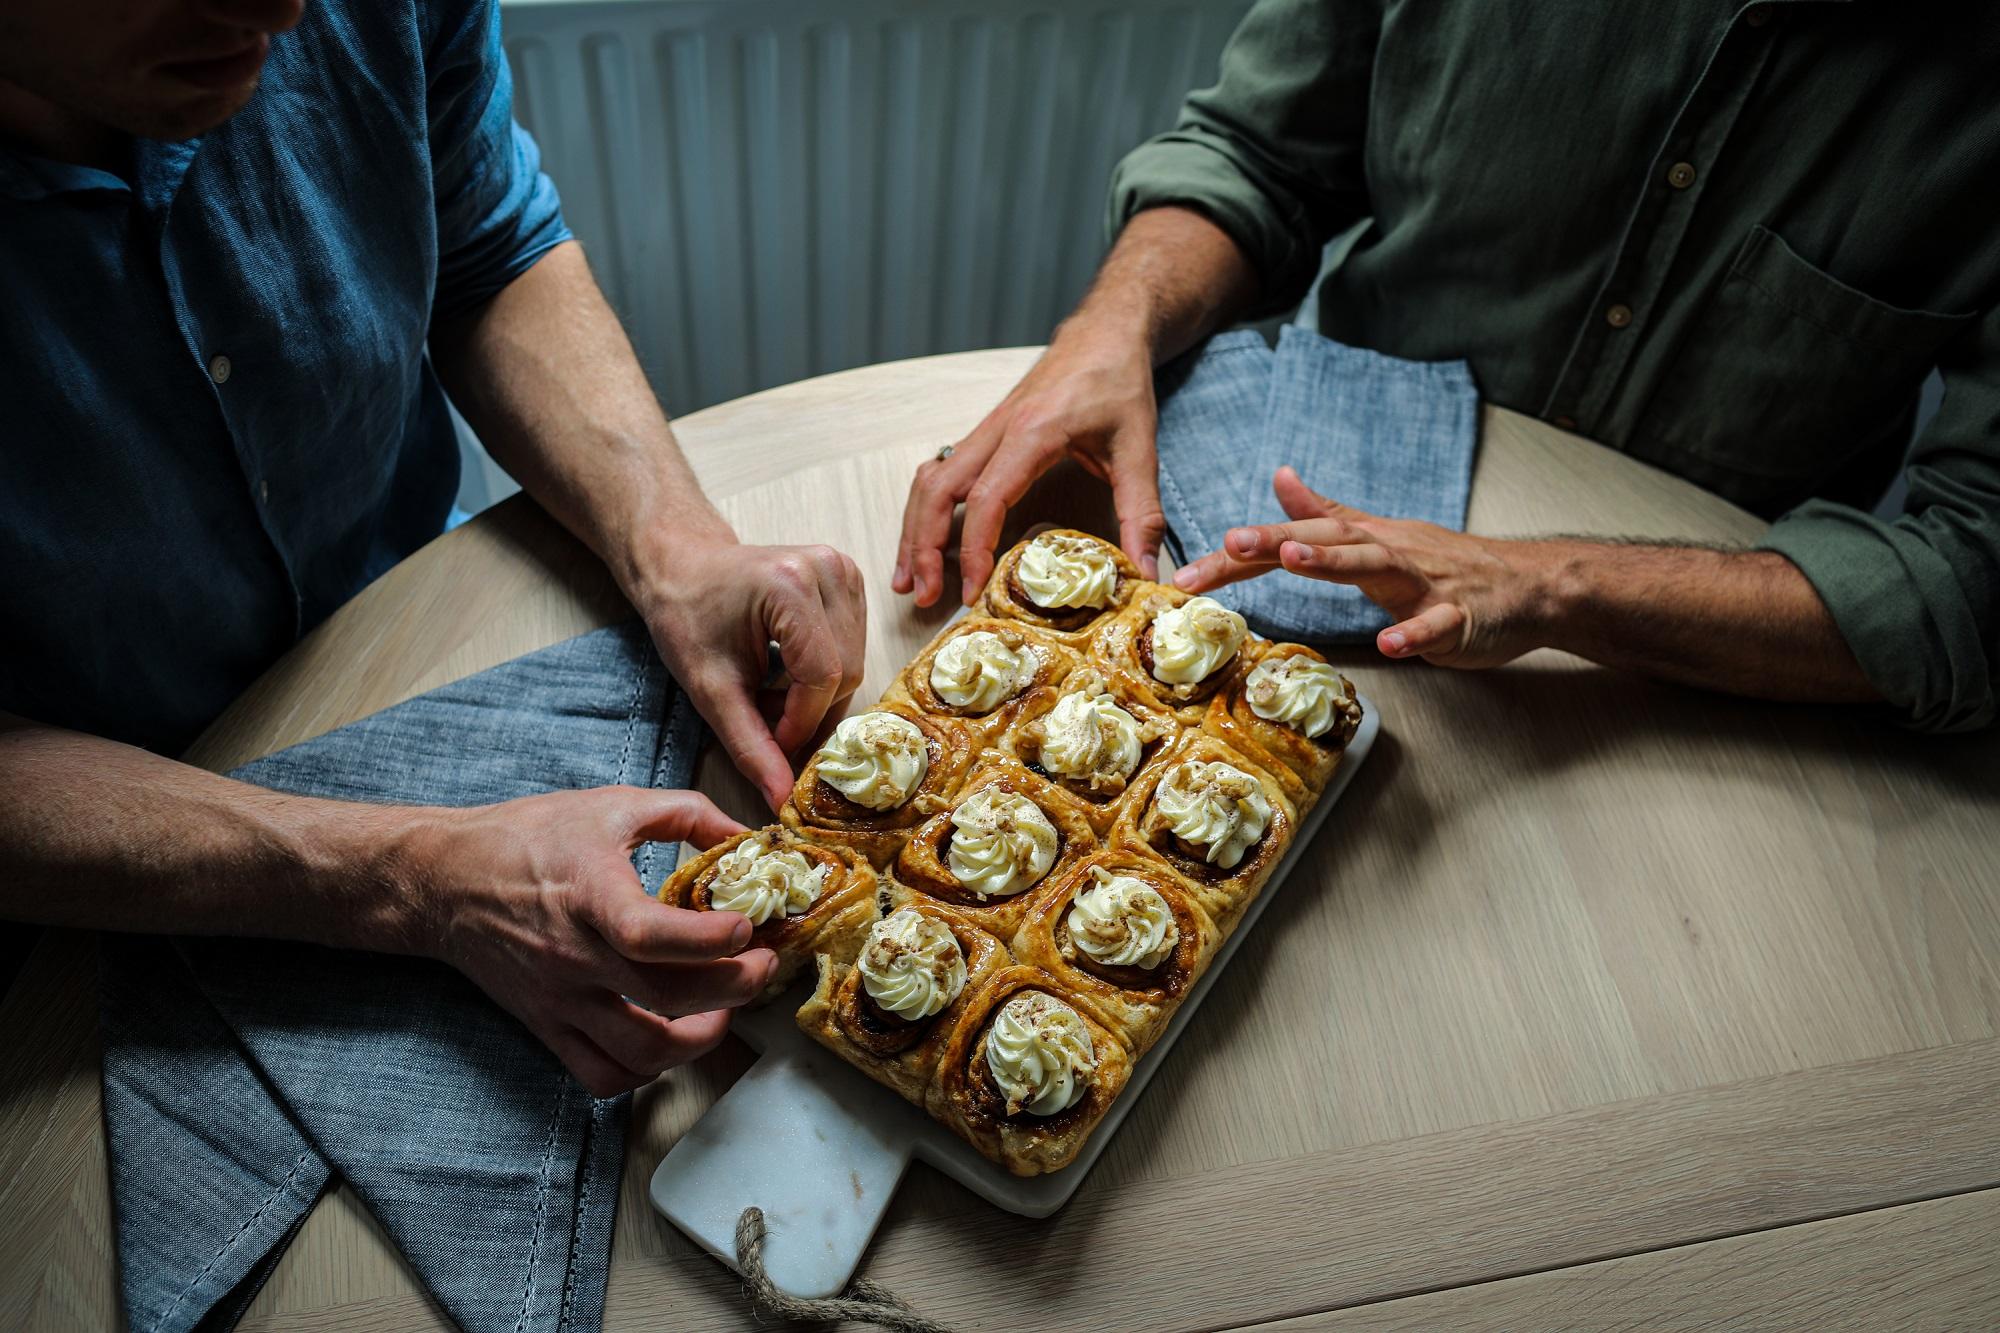 Happiest Together | Enjoying Cinnamon Rolls